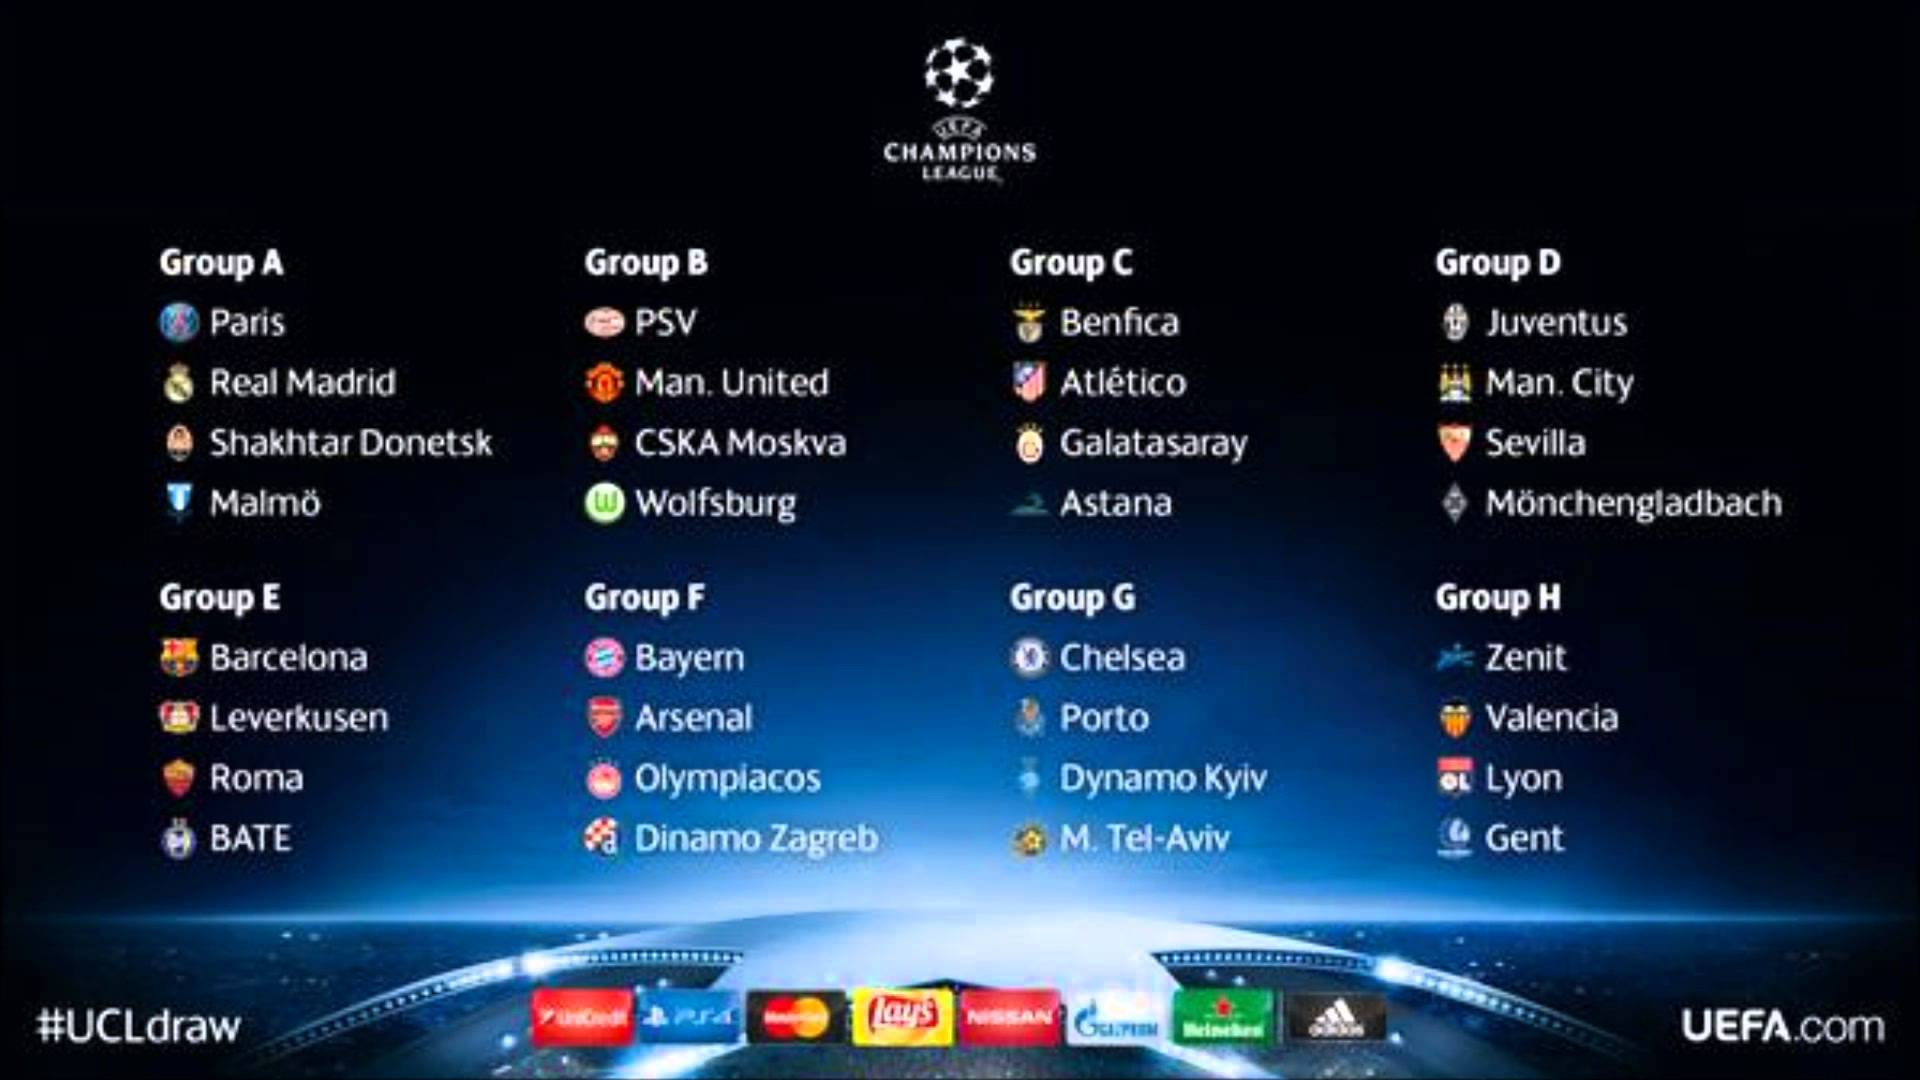 Calendario Coppa Dei Campioni.Gironi E Calendario Champions League 2016 2017 Juventus E